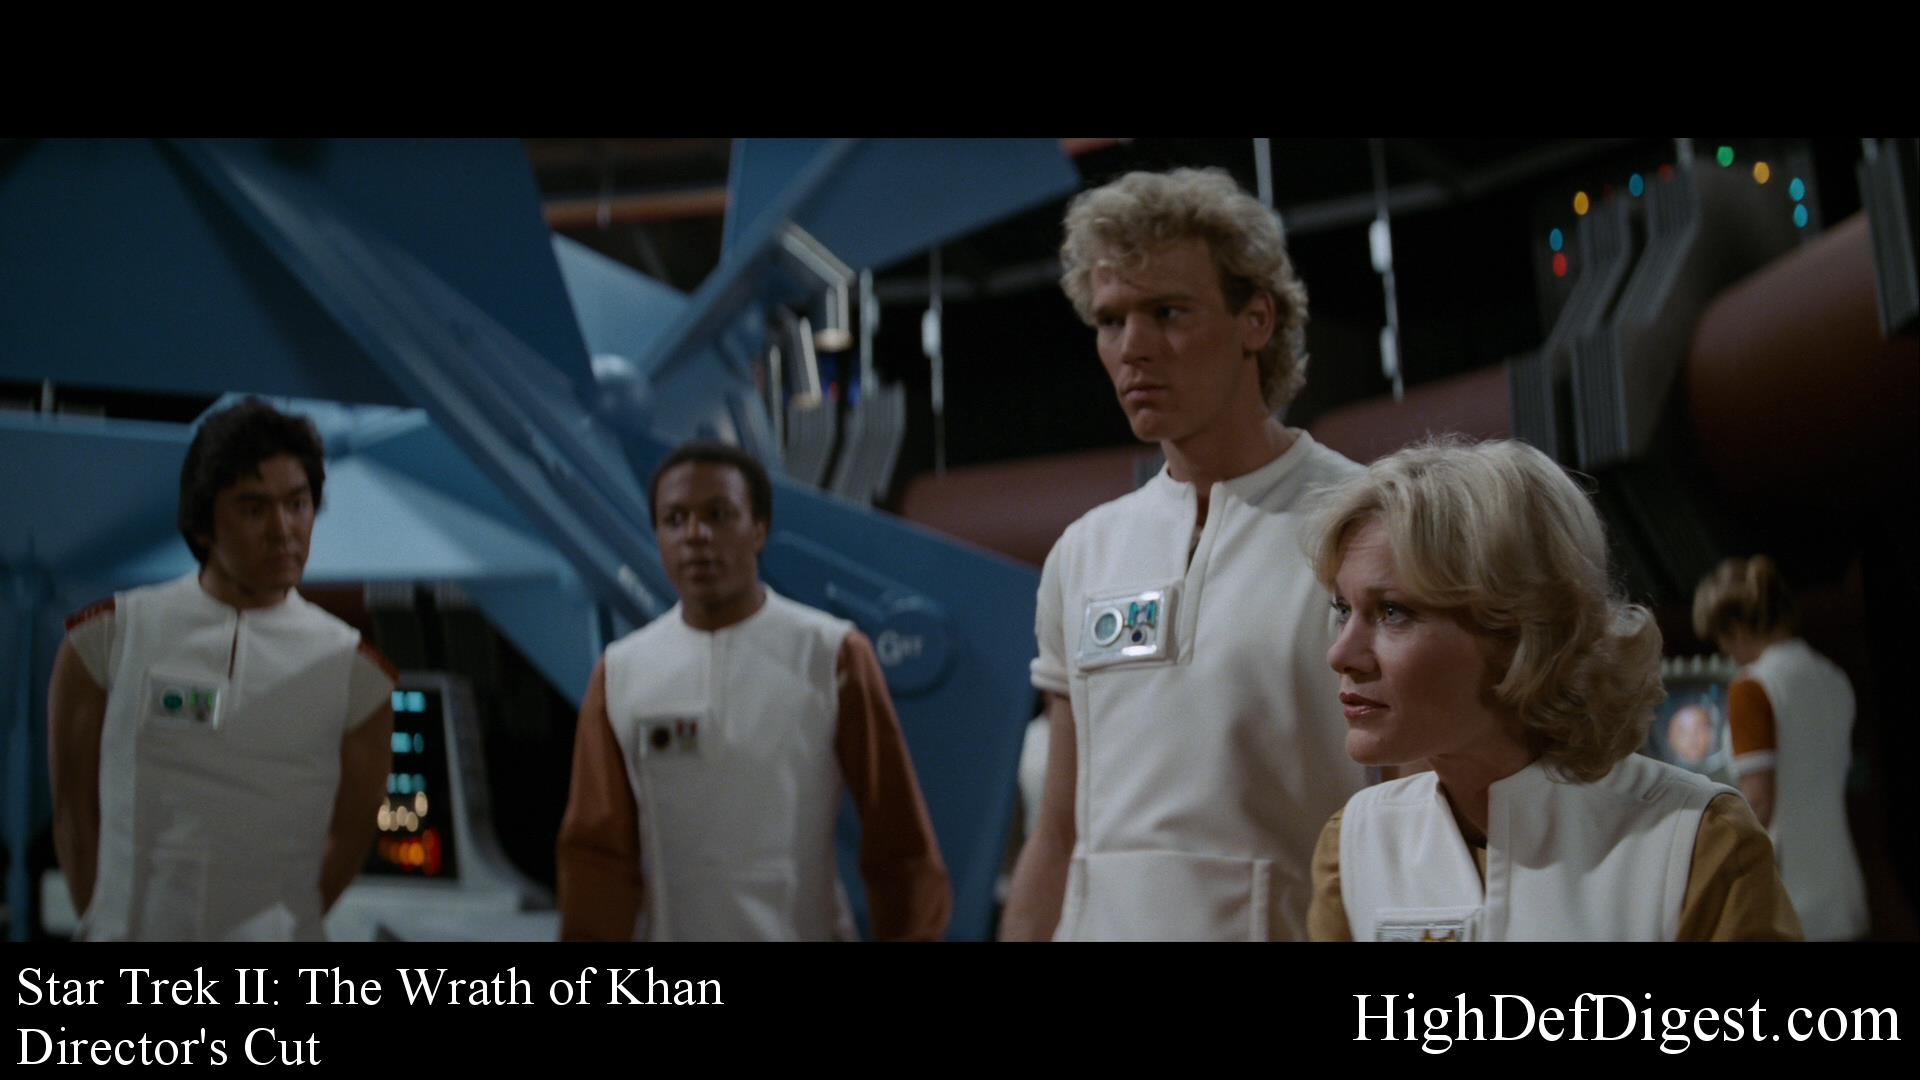 Star Trek: The Wrath of Khan - Comparison 2 (Director's Cut)